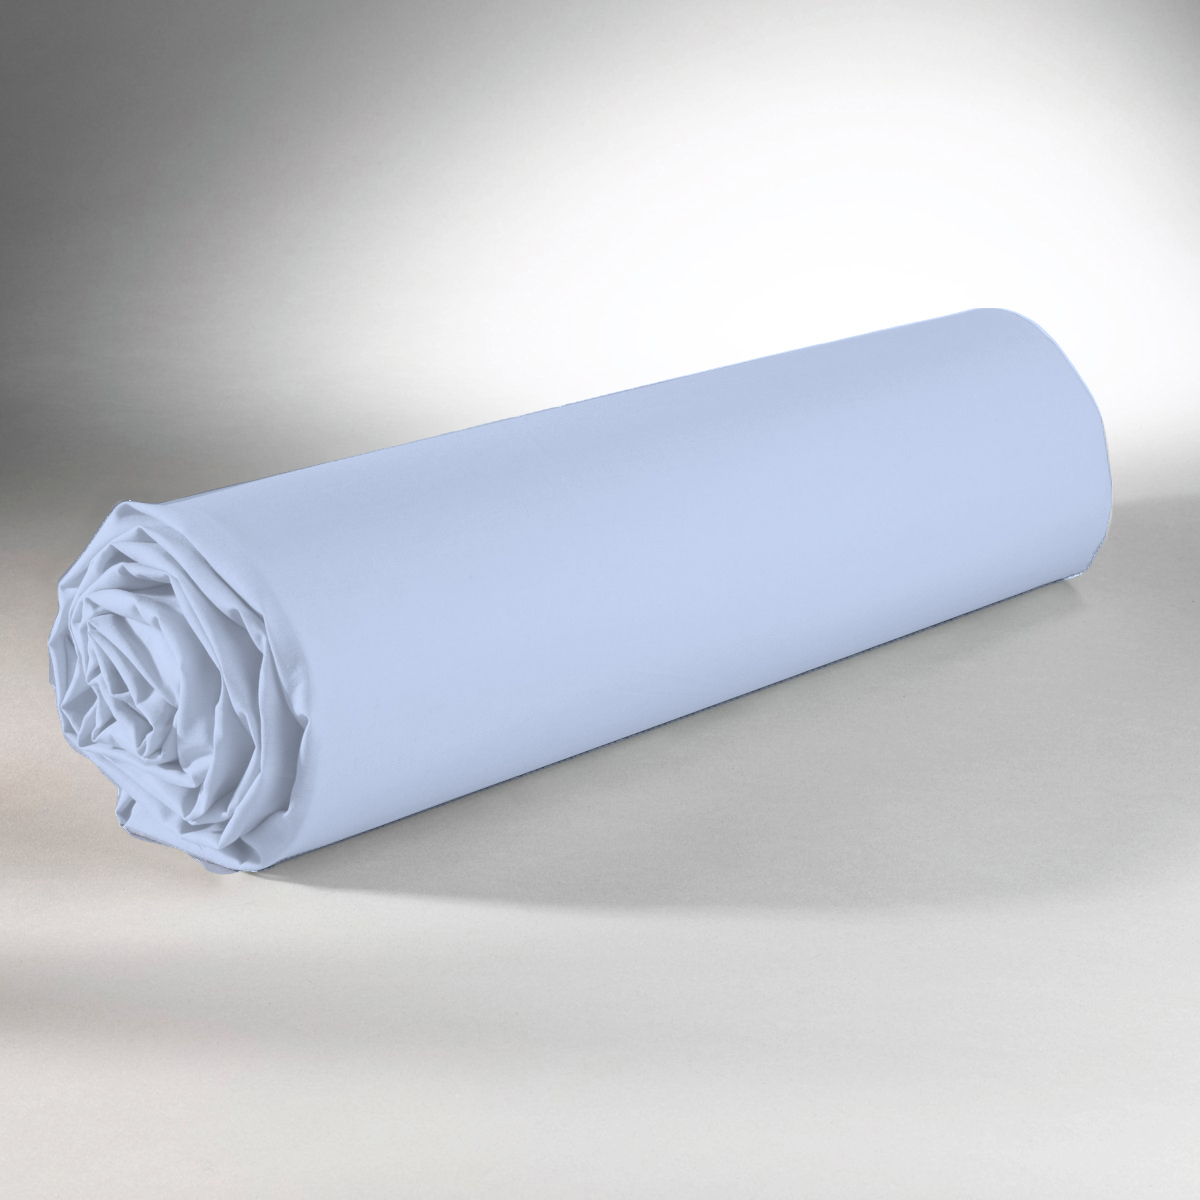 Drap housse 100% coton 160x200+25 bleu clair